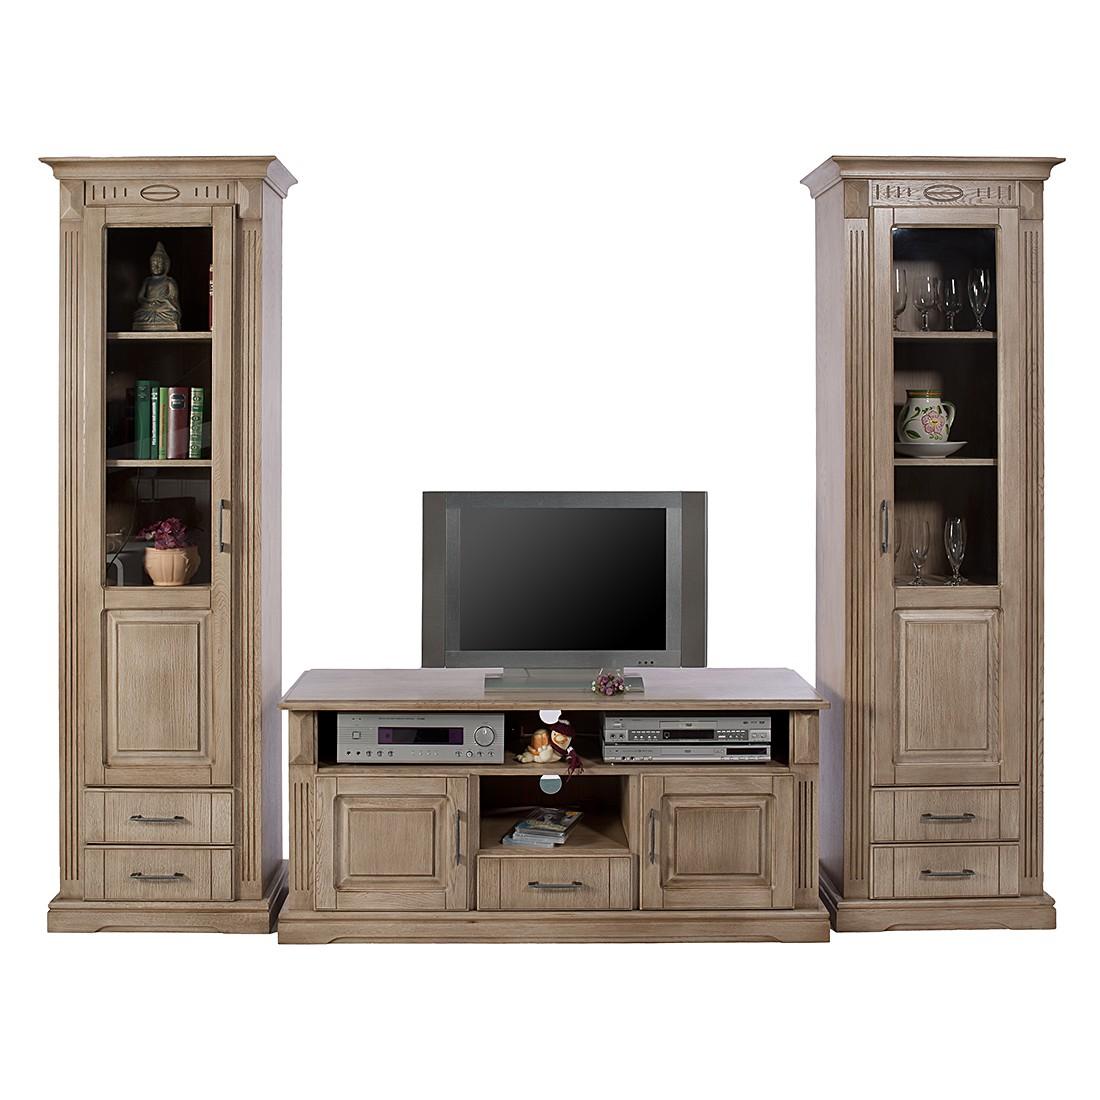 wohnwand parzival i 3 teilig eiche teilmassiv tr ffel jung s hne g nstig. Black Bedroom Furniture Sets. Home Design Ideas